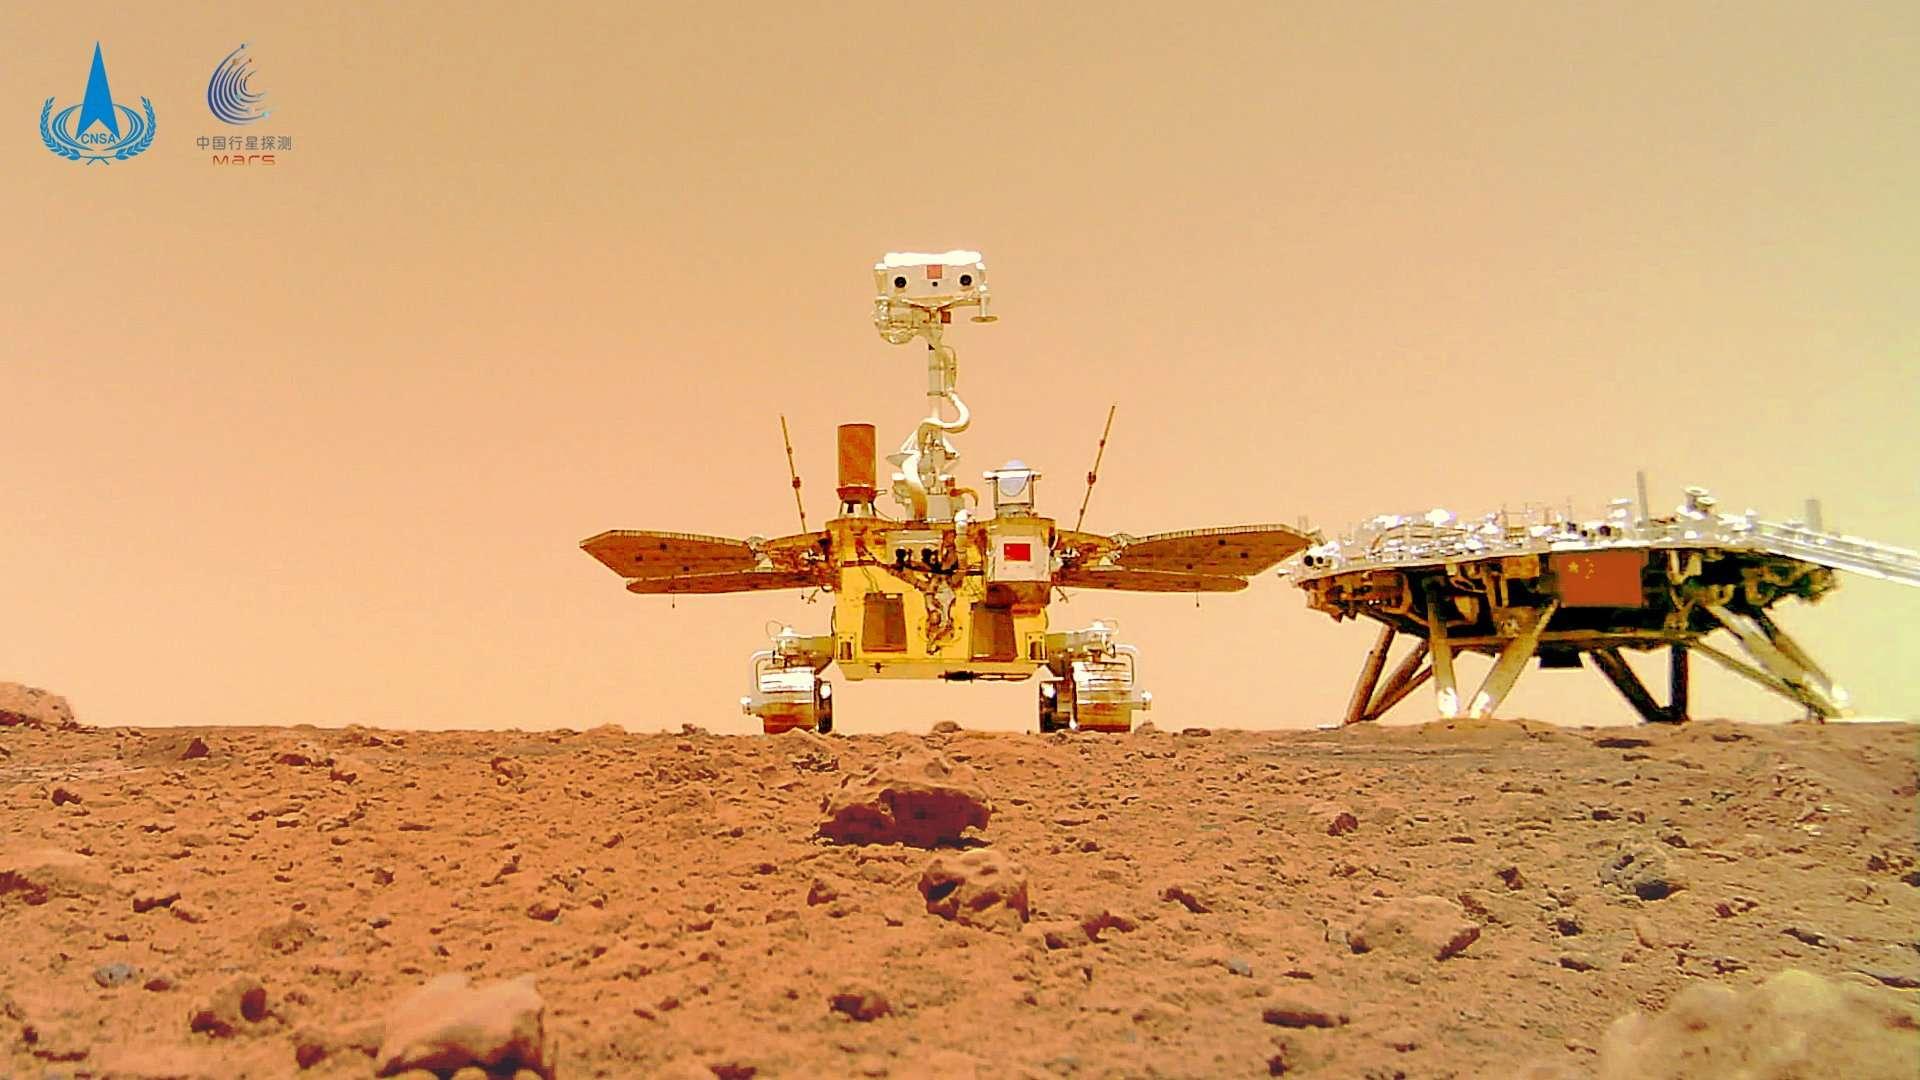 Premier « selfie » du rover chinois Zhurong sur Mars. © CNSA